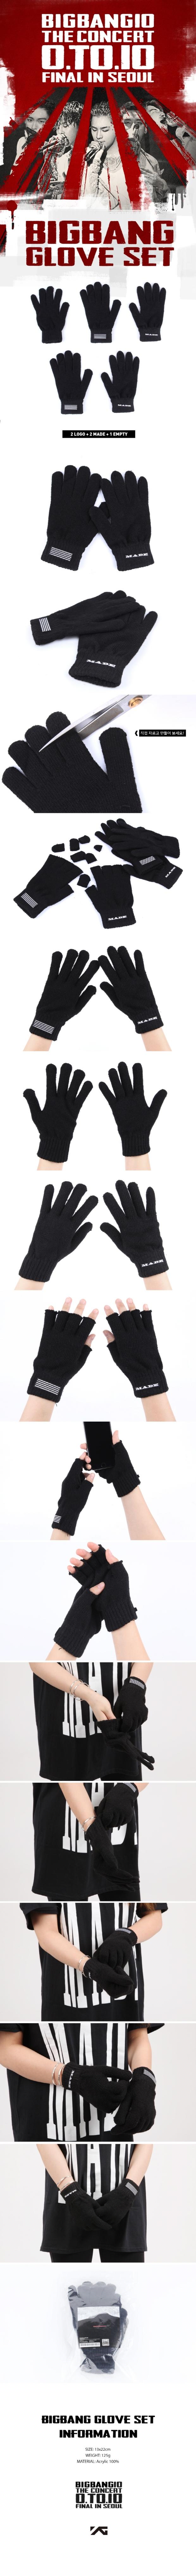 11_bigbangmade0to10web_glove_01